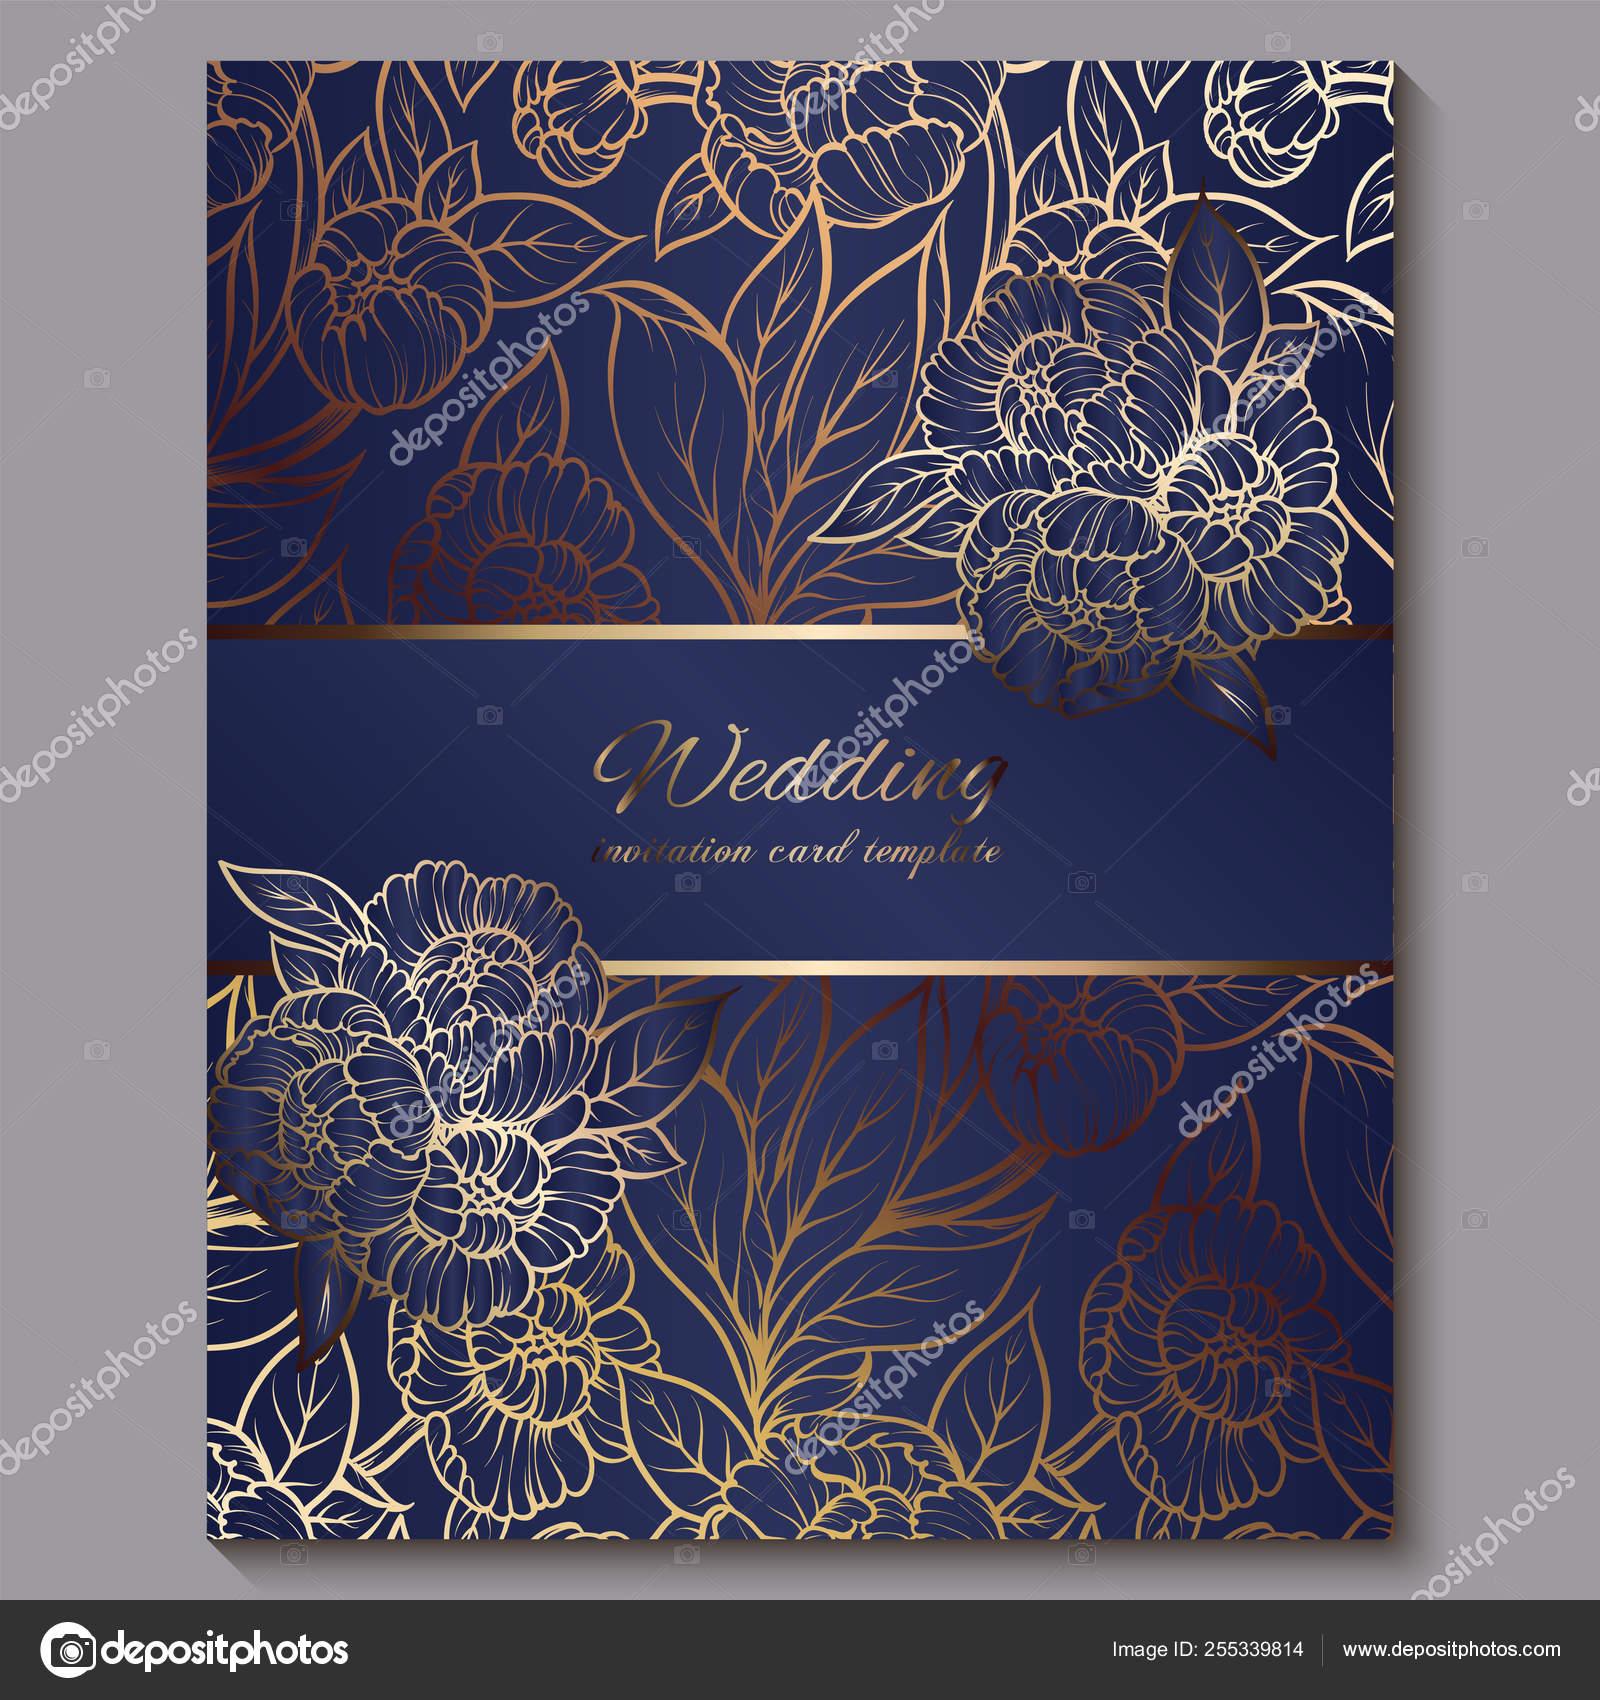 Wedding Invitations Royal Blue Exquisite Royal Luxury